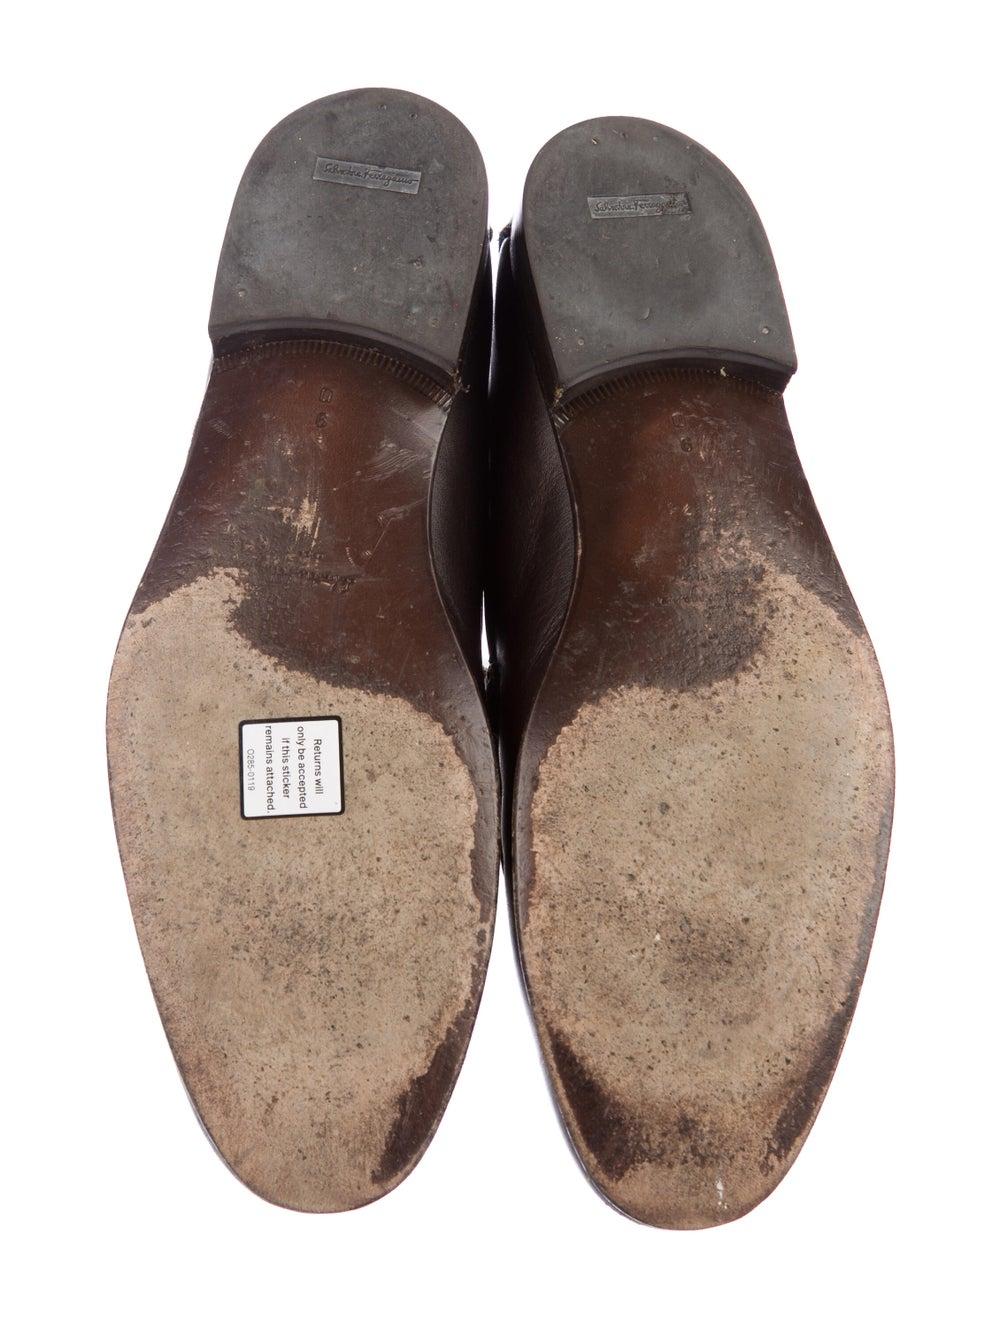 Salvatore Ferragamo Leather Penny Loafers - image 5